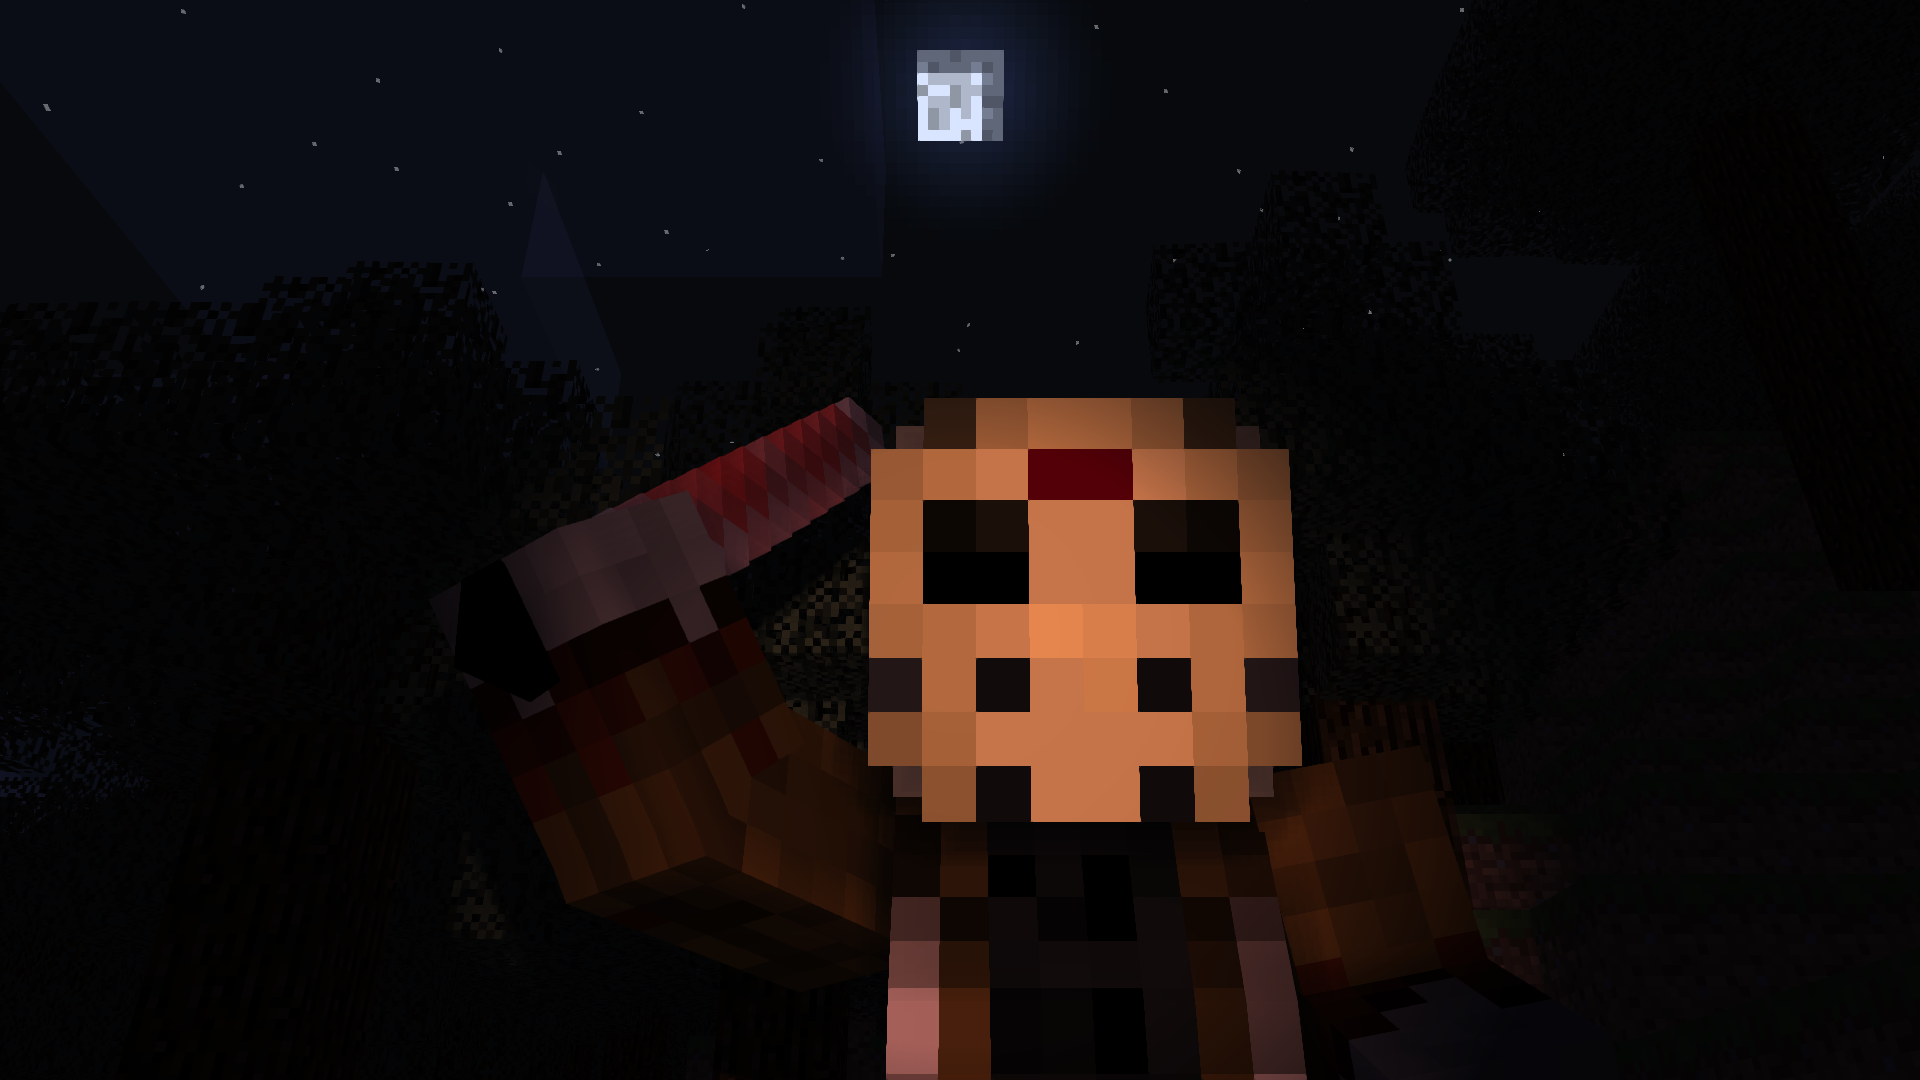 Cve4ypt Friday The 13th Minecraft 2514534 Hd Wallpaper